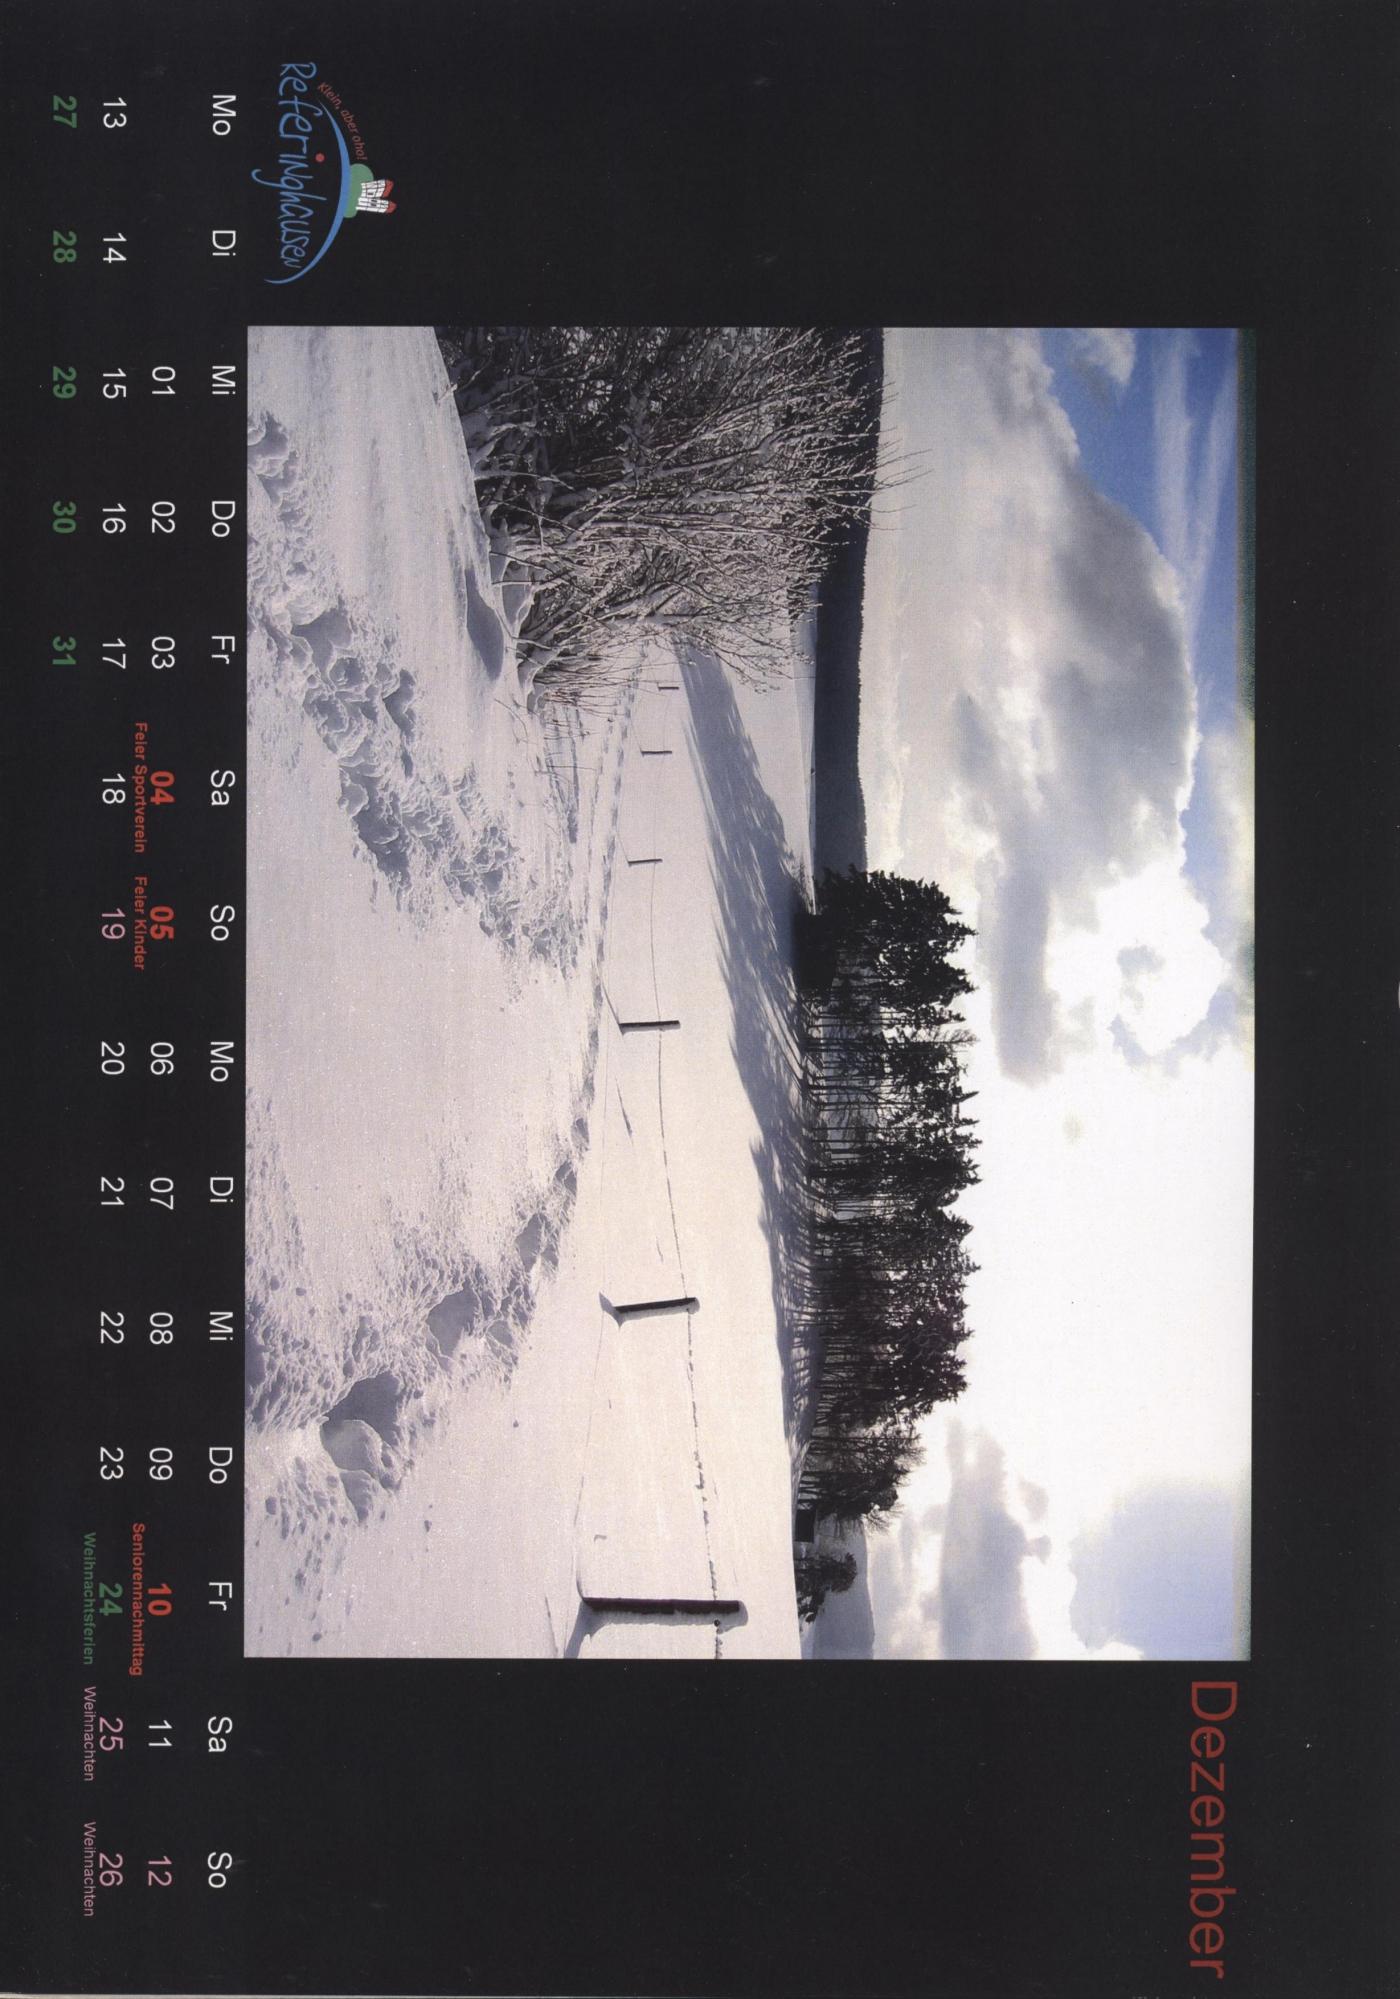 Kalender 2010 Teil 3